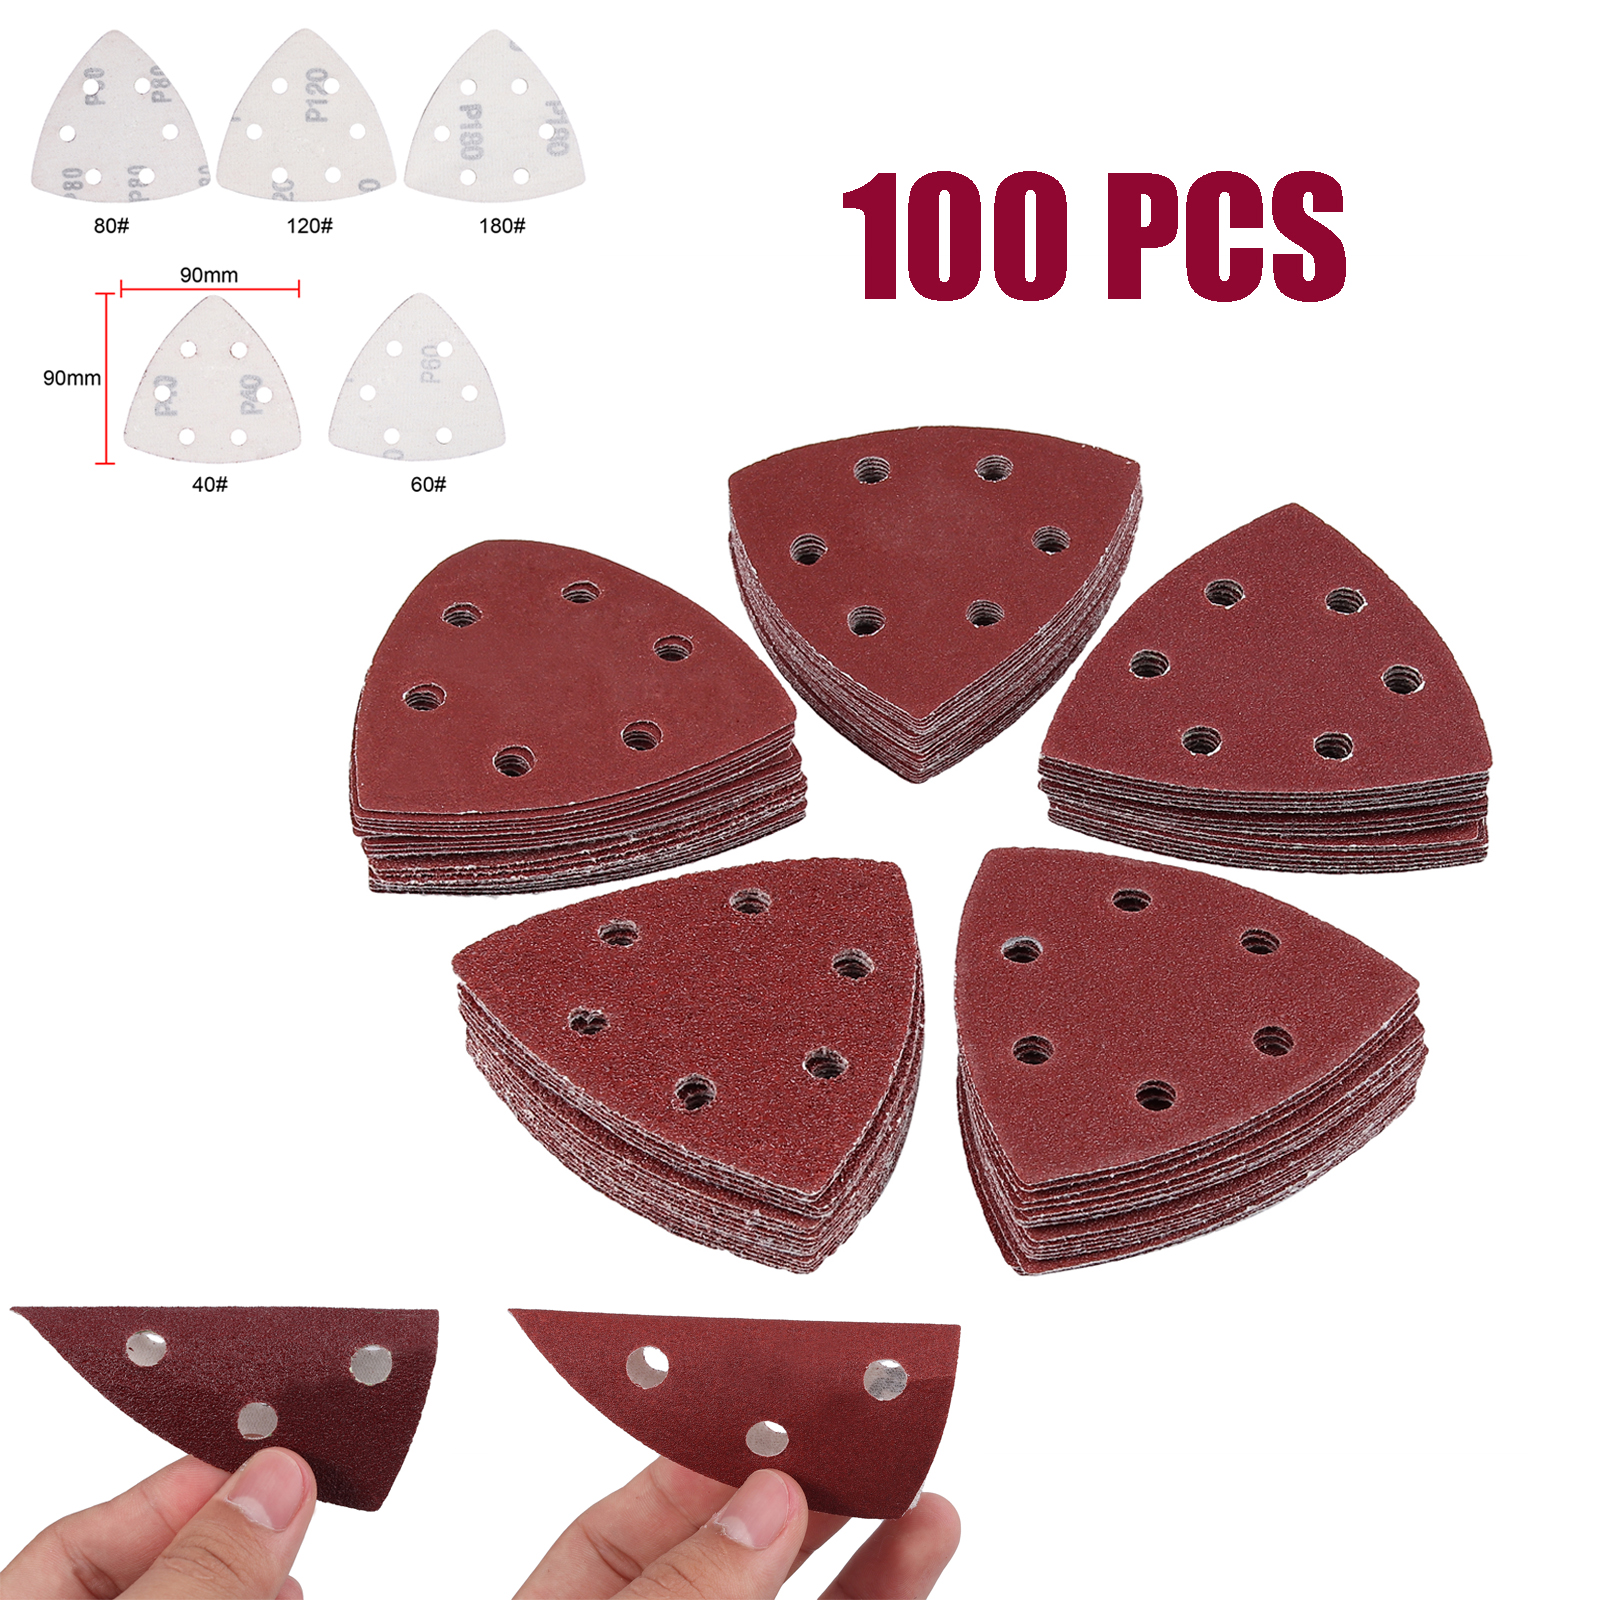 50pcs Sanding Sandpaper Triangle Sheets 90mm 6 Holes 60 Grit